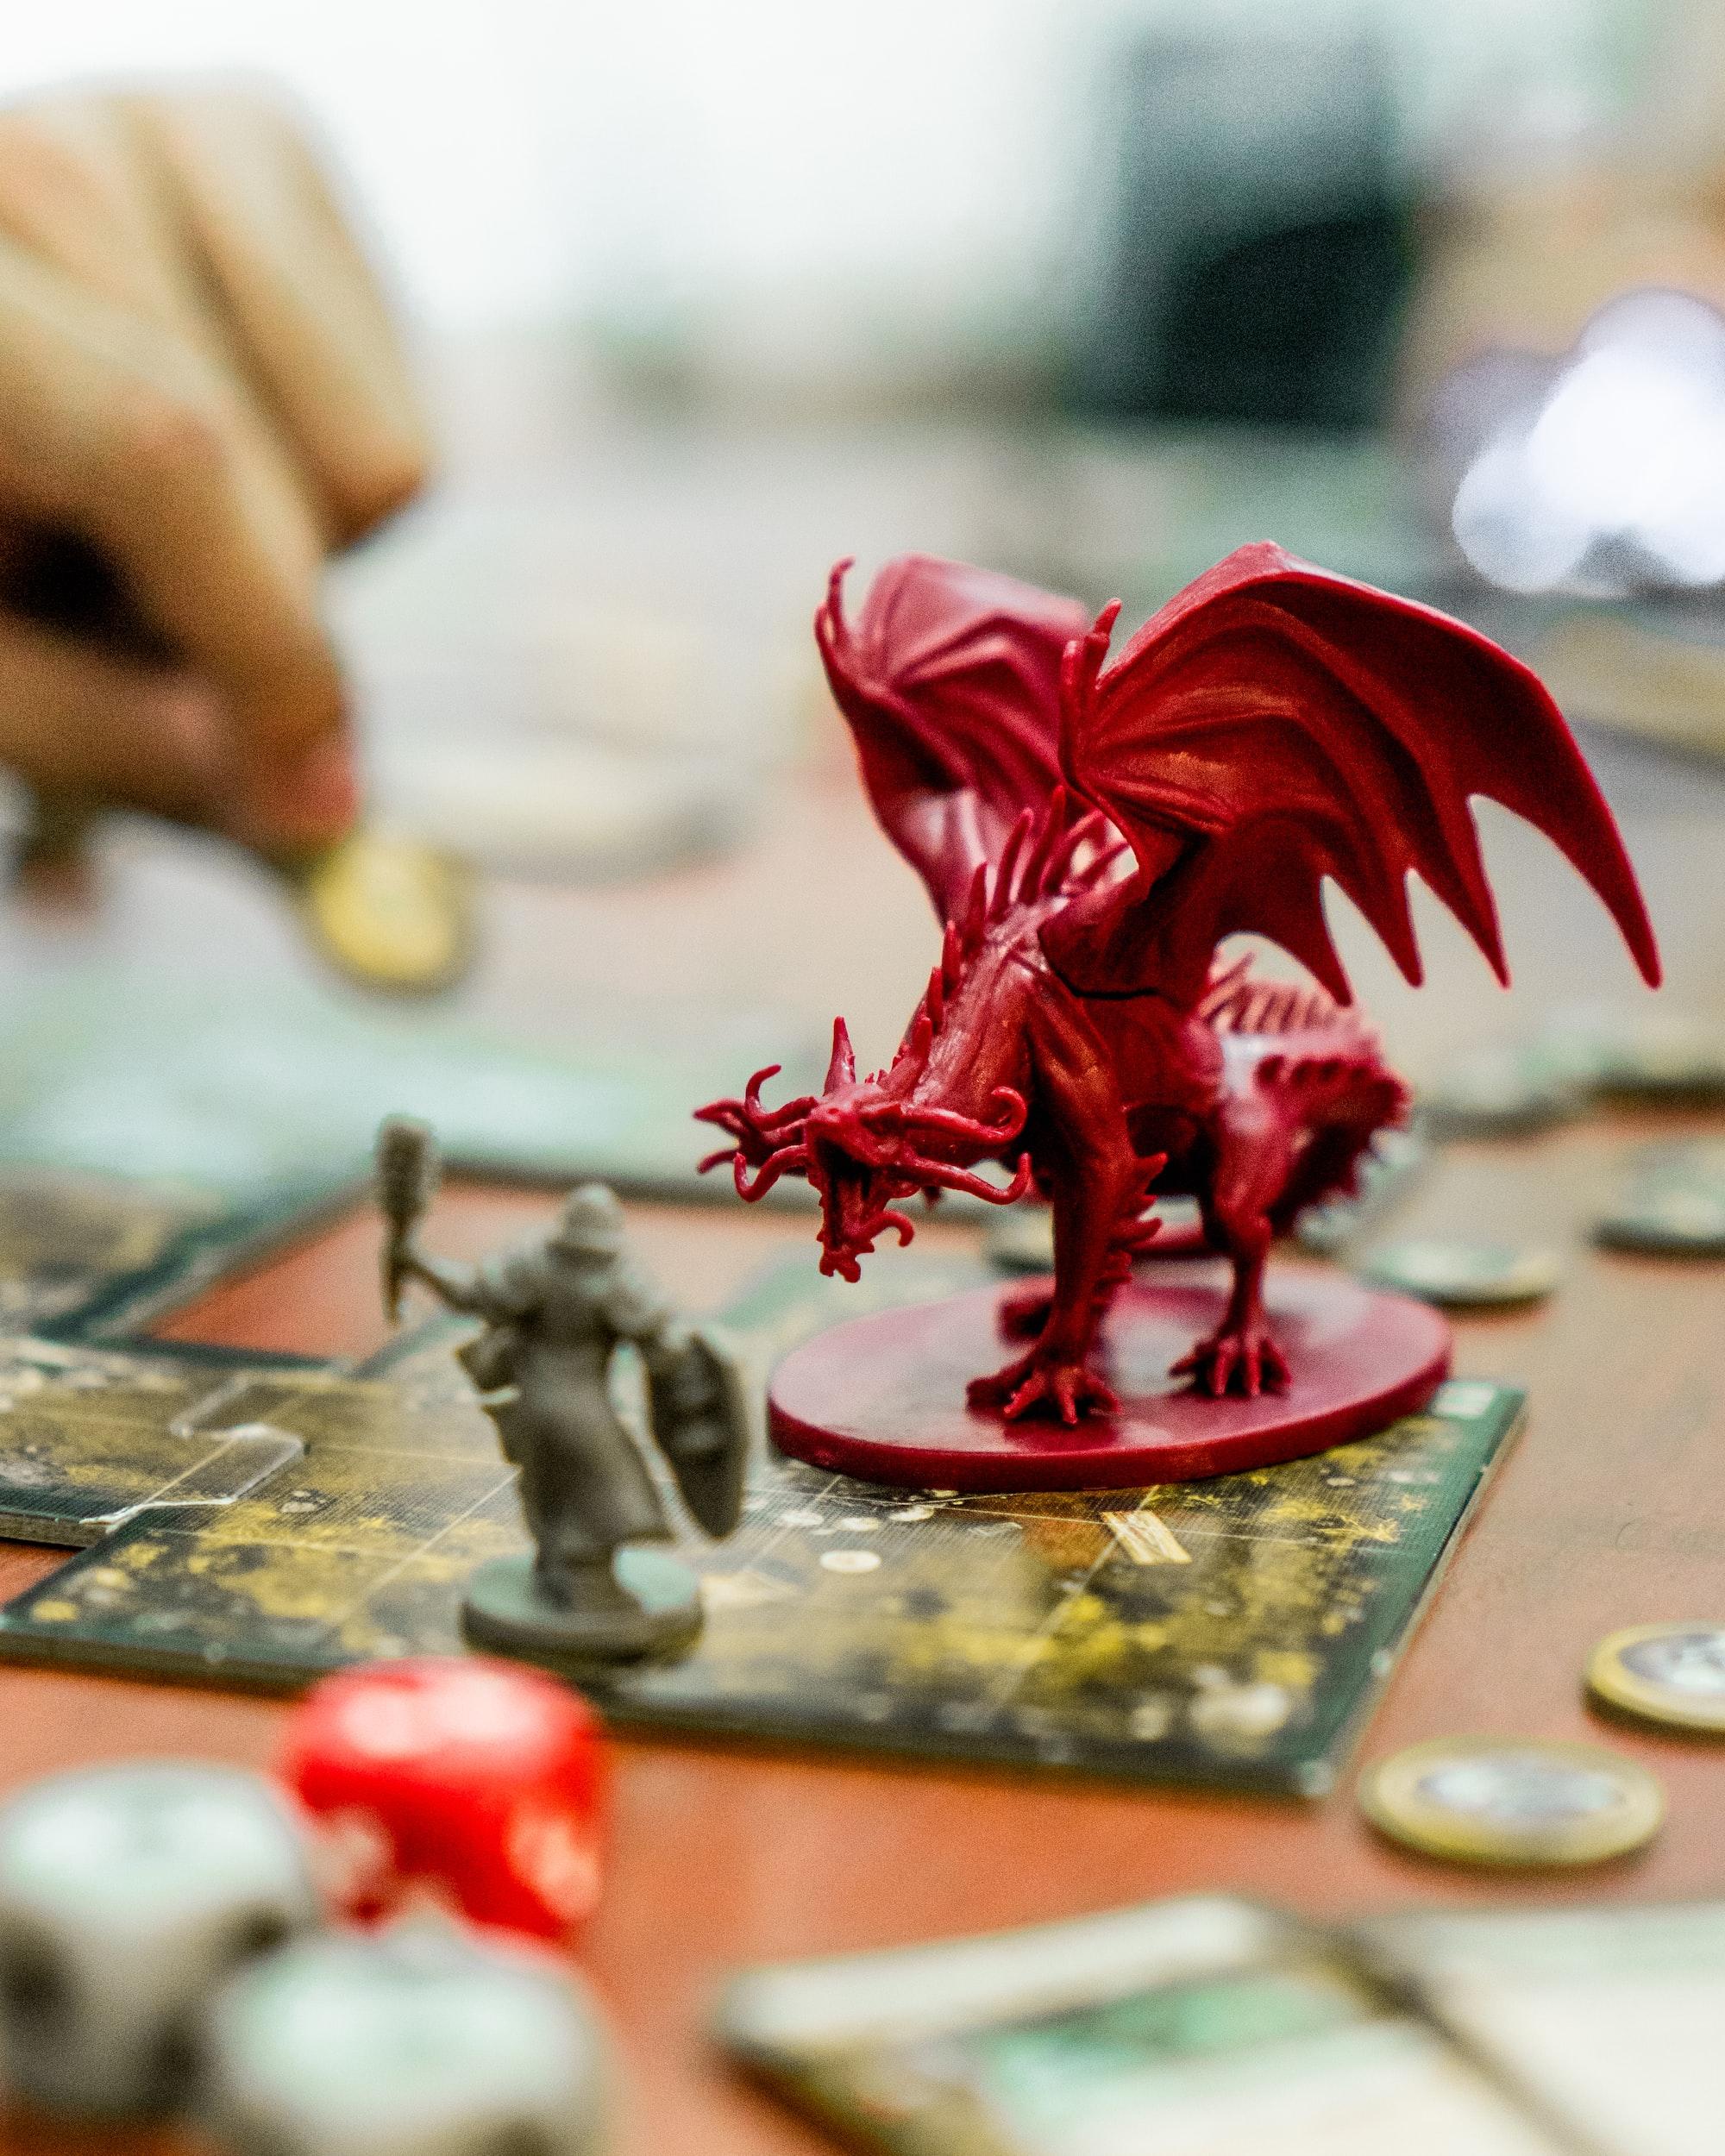 Poem: Dragon of Avalon